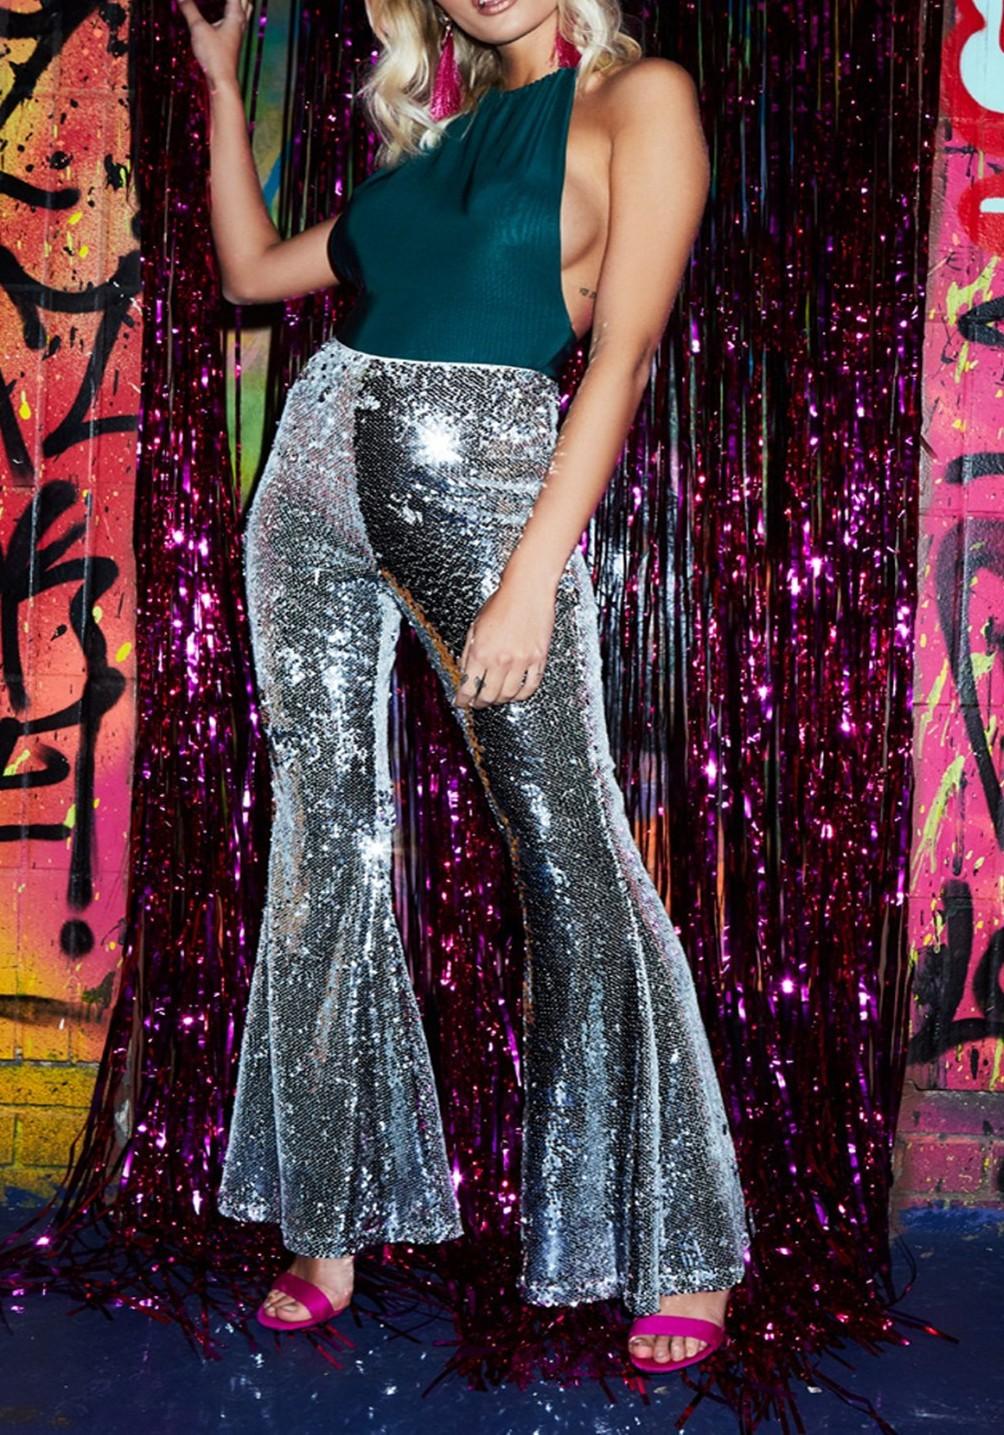 da382f1718 Silver Sequin Glitter Trendy Party Flare Bell Bottom Long Pants - Pants -  Bottoms